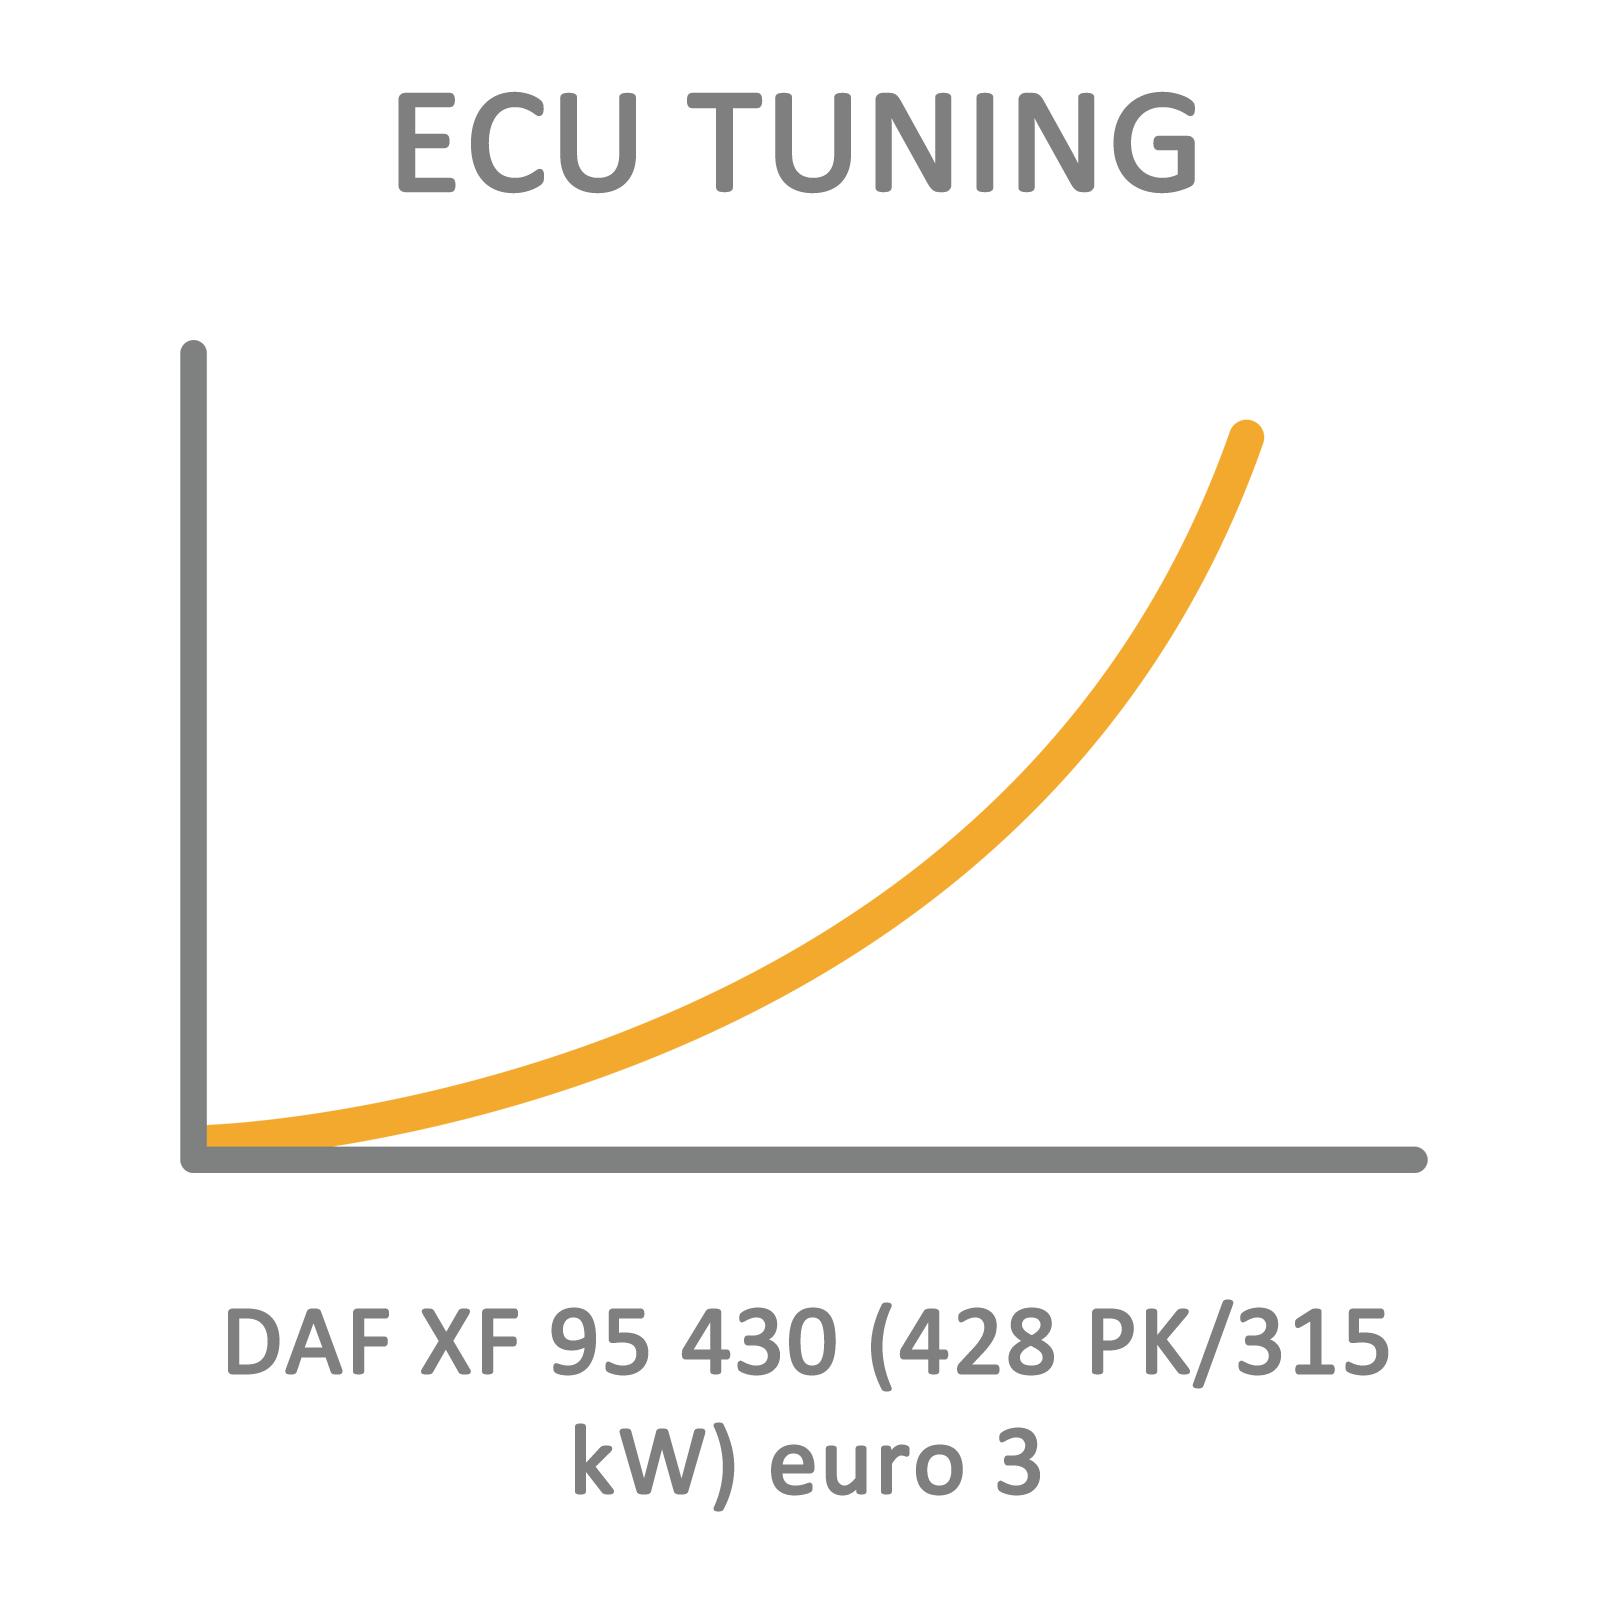 DAF XF 95 430 (428 PK/315 kW) euro 3 ECU Tuning Remapping